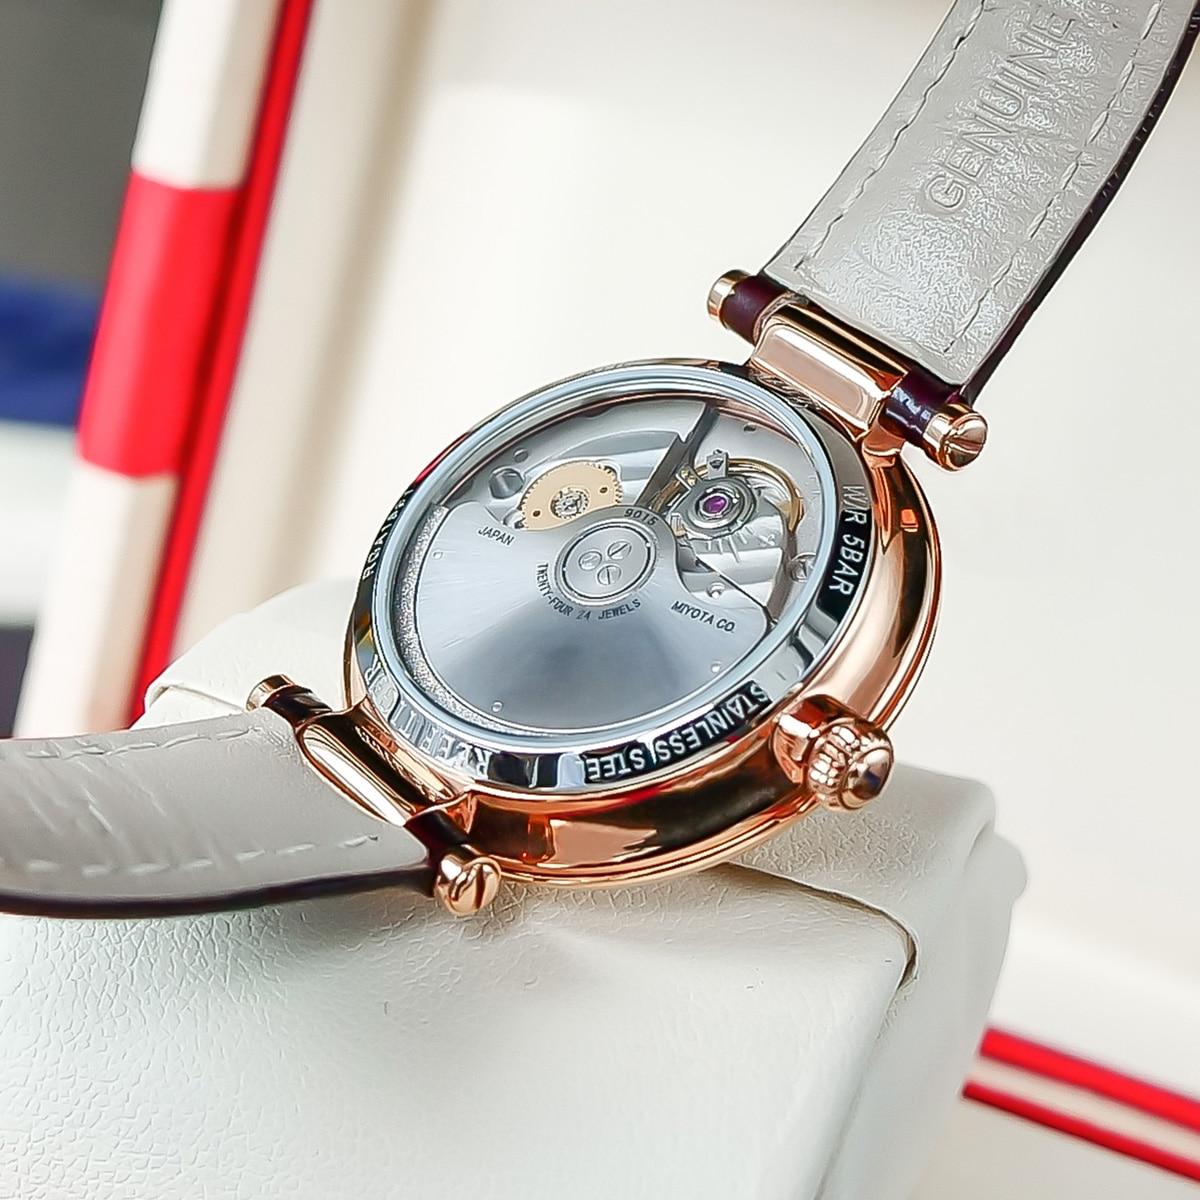 Reef Tiger/RT Luxury Automatic Day Date Watch Steel Waterproof Blue Genuine Leather Women Watches Relogio Feminino Gift RGA1595 enlarge